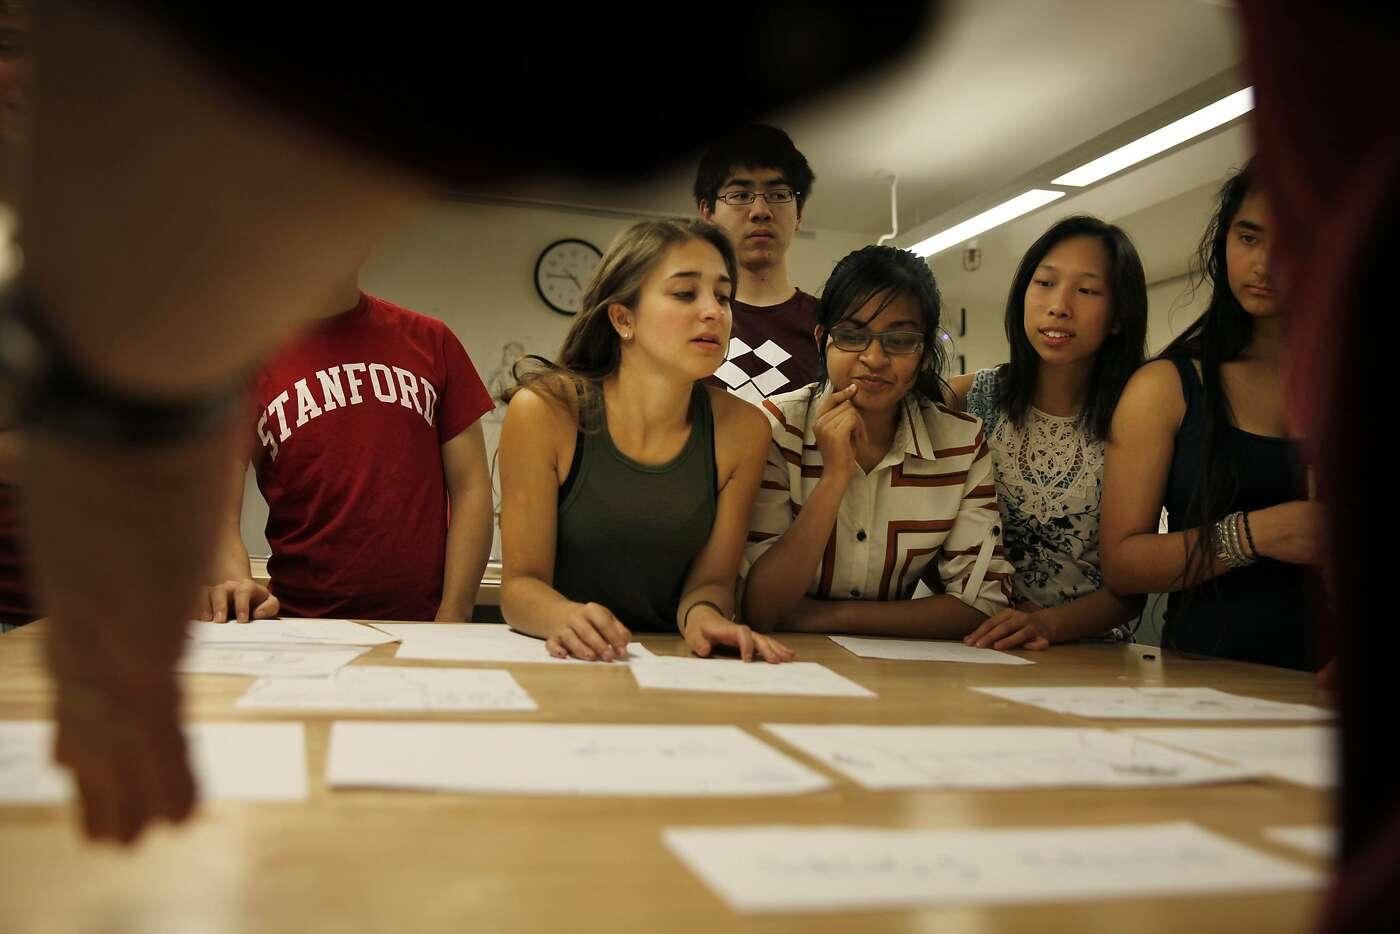 Arts explosion rocks Stanford - San Francisco Chronicle